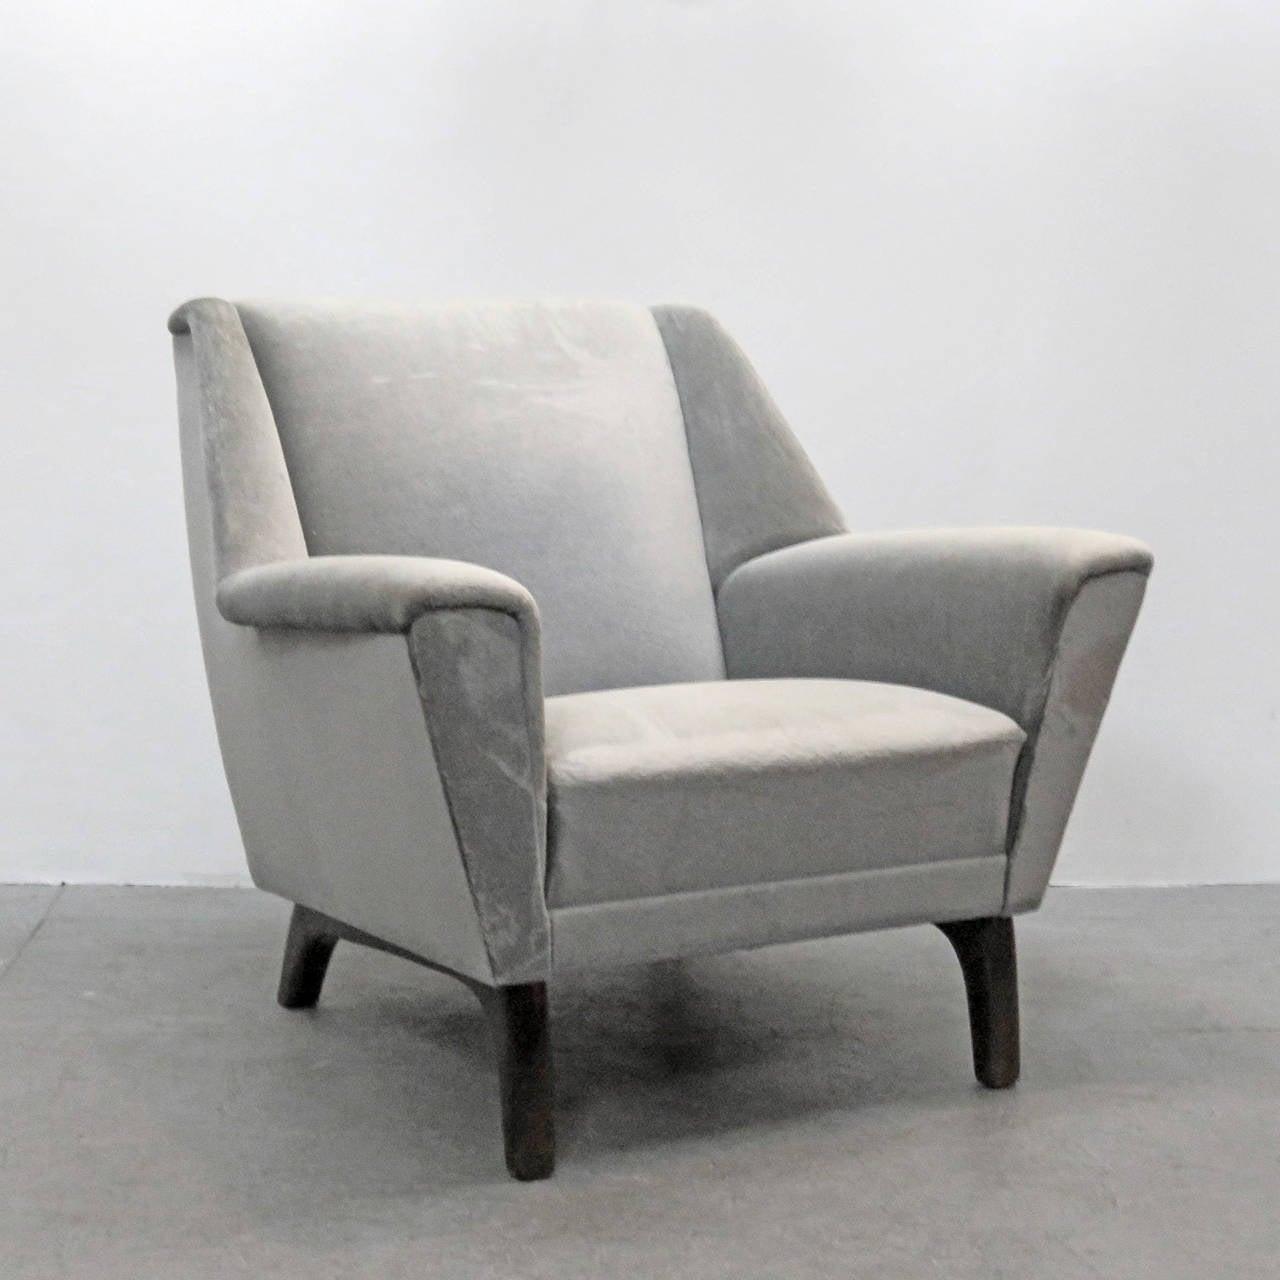 danish lounge chairs at 1stdibs